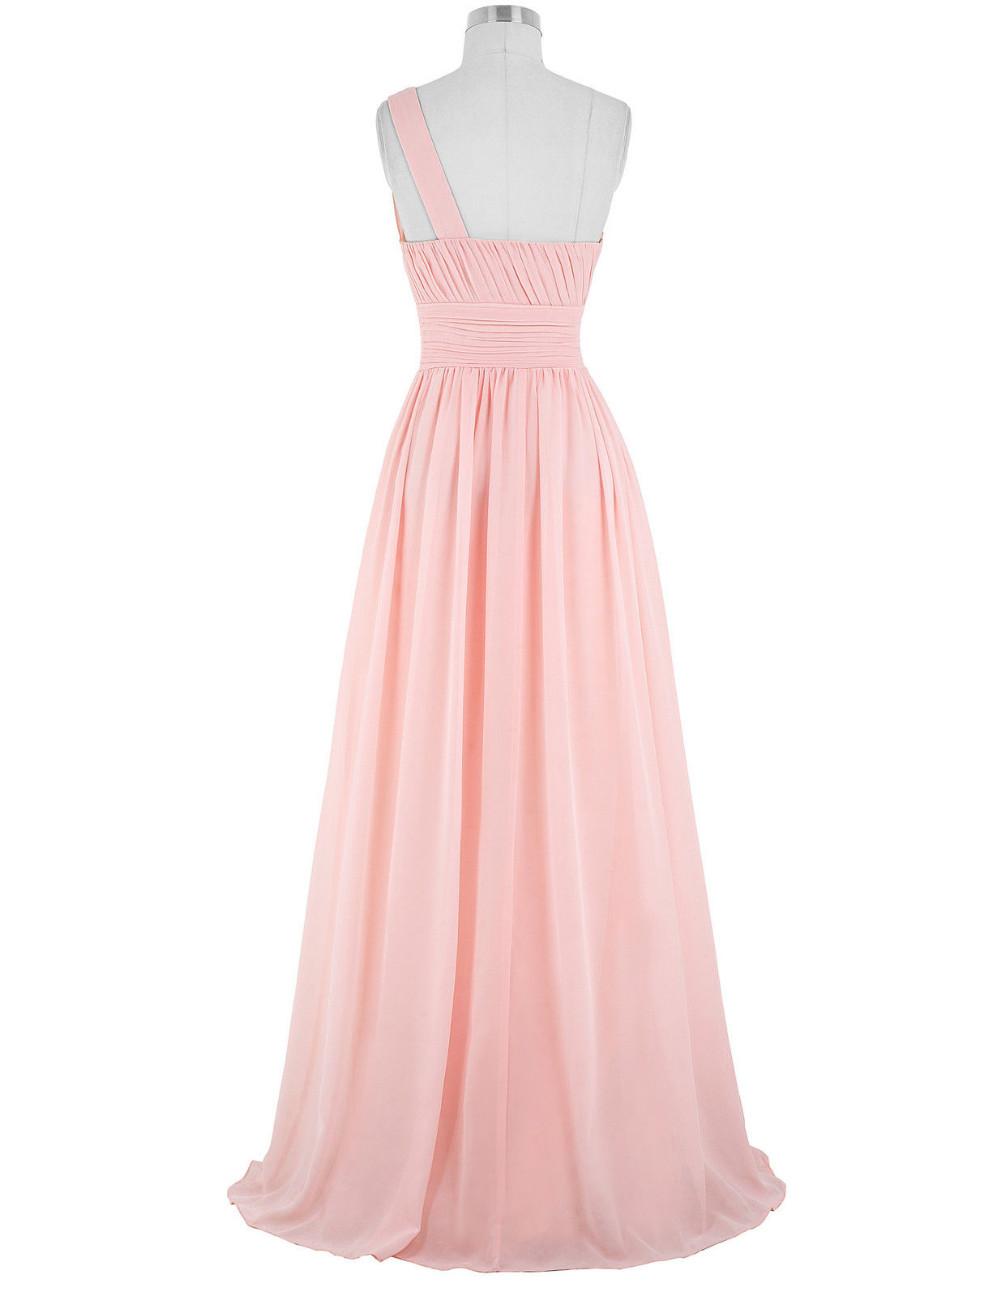 Kate Kasin Mint Green Bridesmaid Dresses Long Wedding Party Dresses One Shouler Bruidsmeisjes Jurk Pink Bridemaid Dress 0200 12